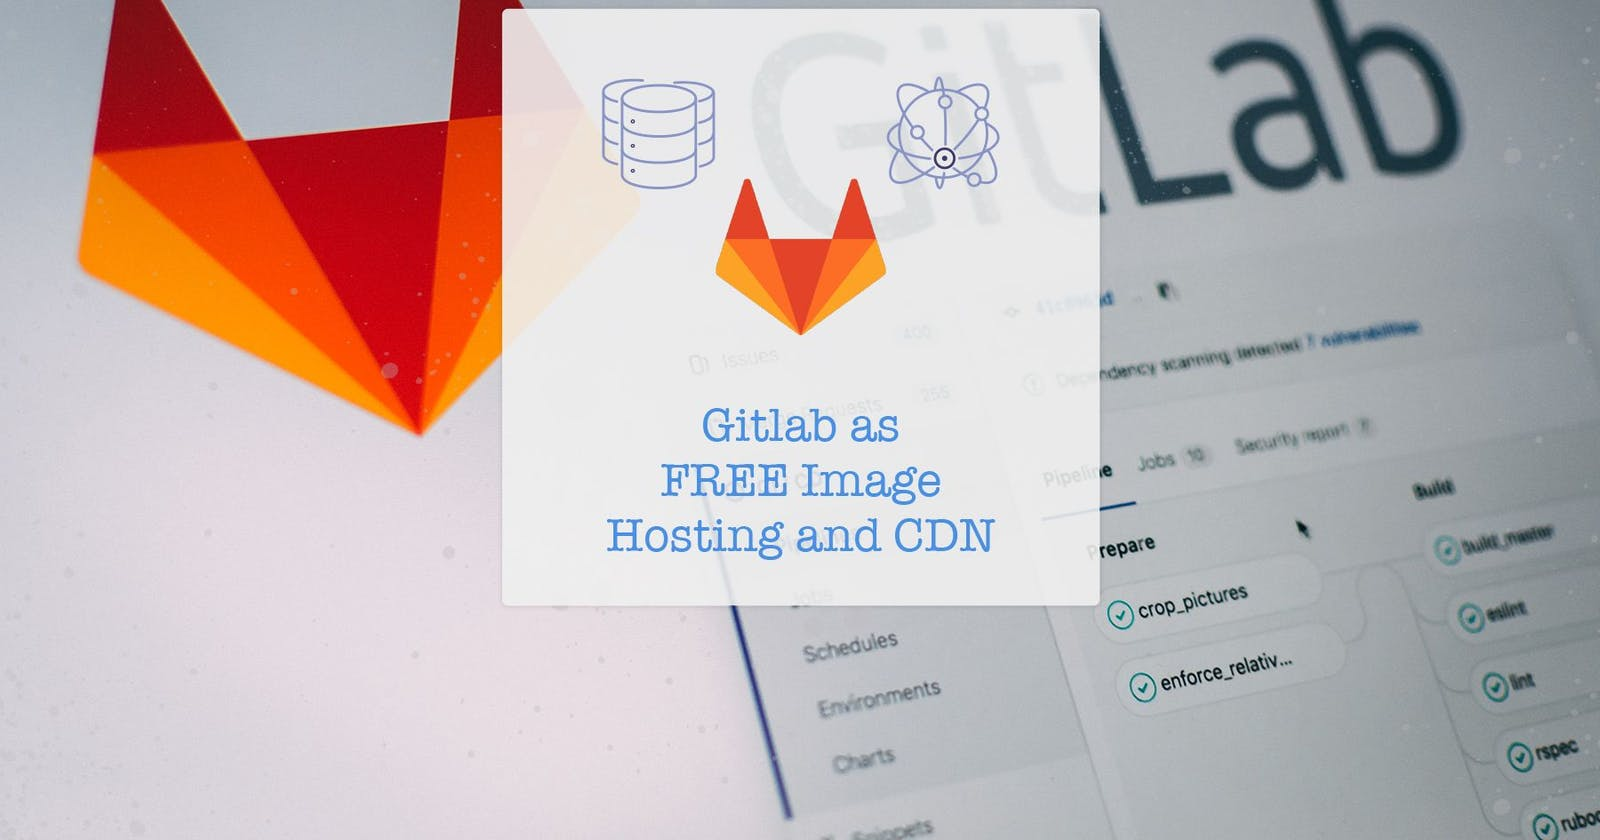 FREE Image Hosting with Gitlab